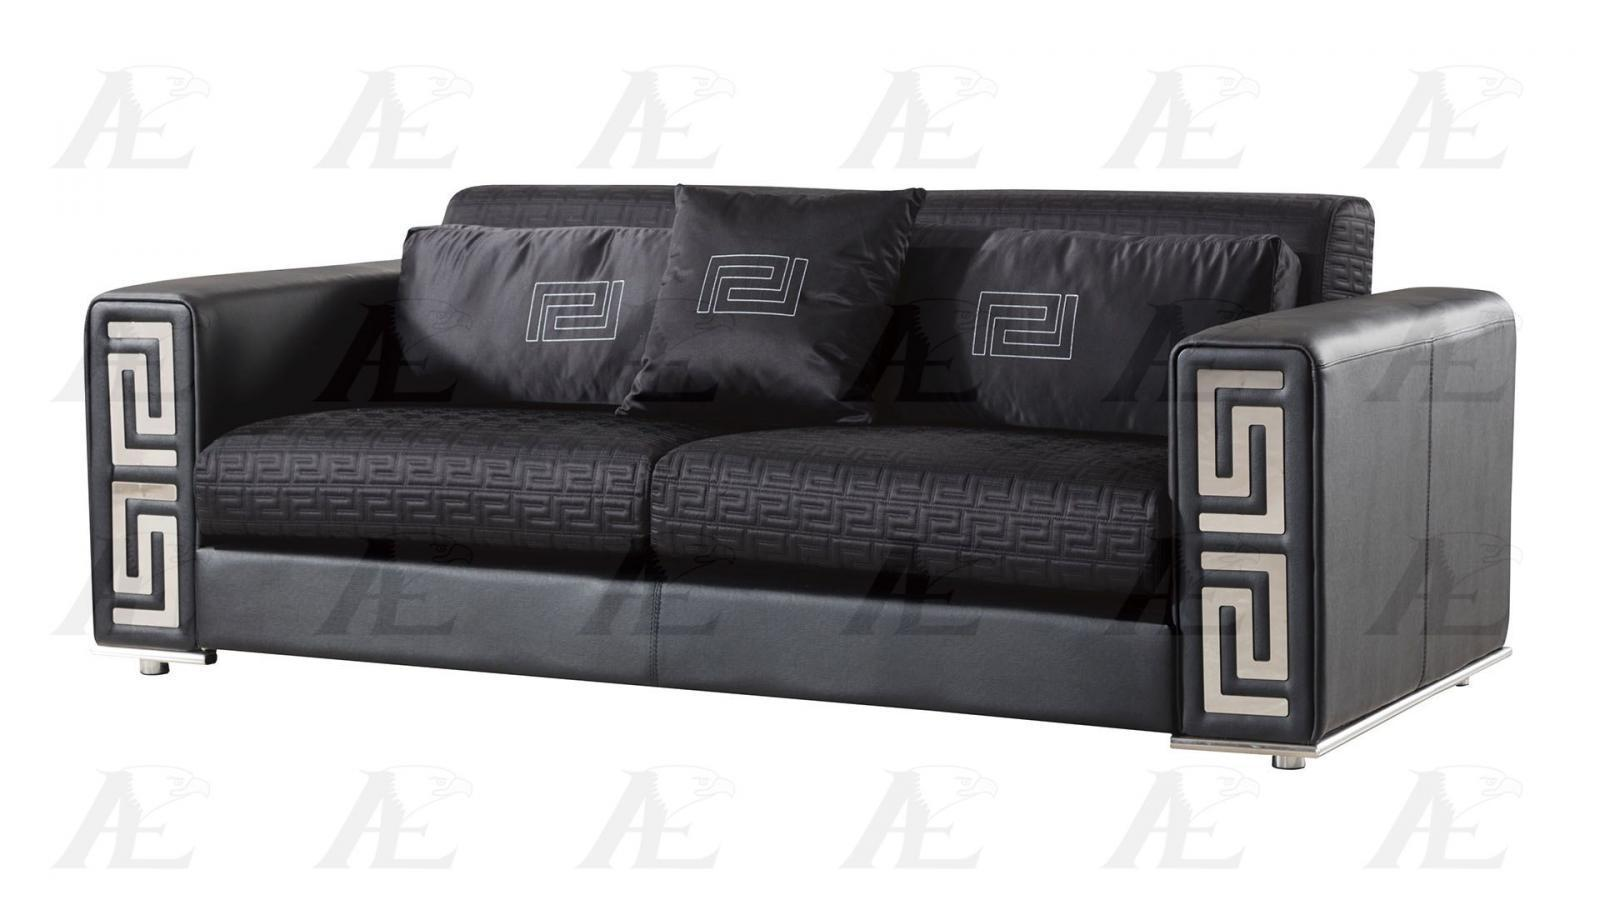 American Eagle Ae223 Bk Black Sofa And Loveseat Faux Leather Set 2pcs Sofas Loveseats Chaises